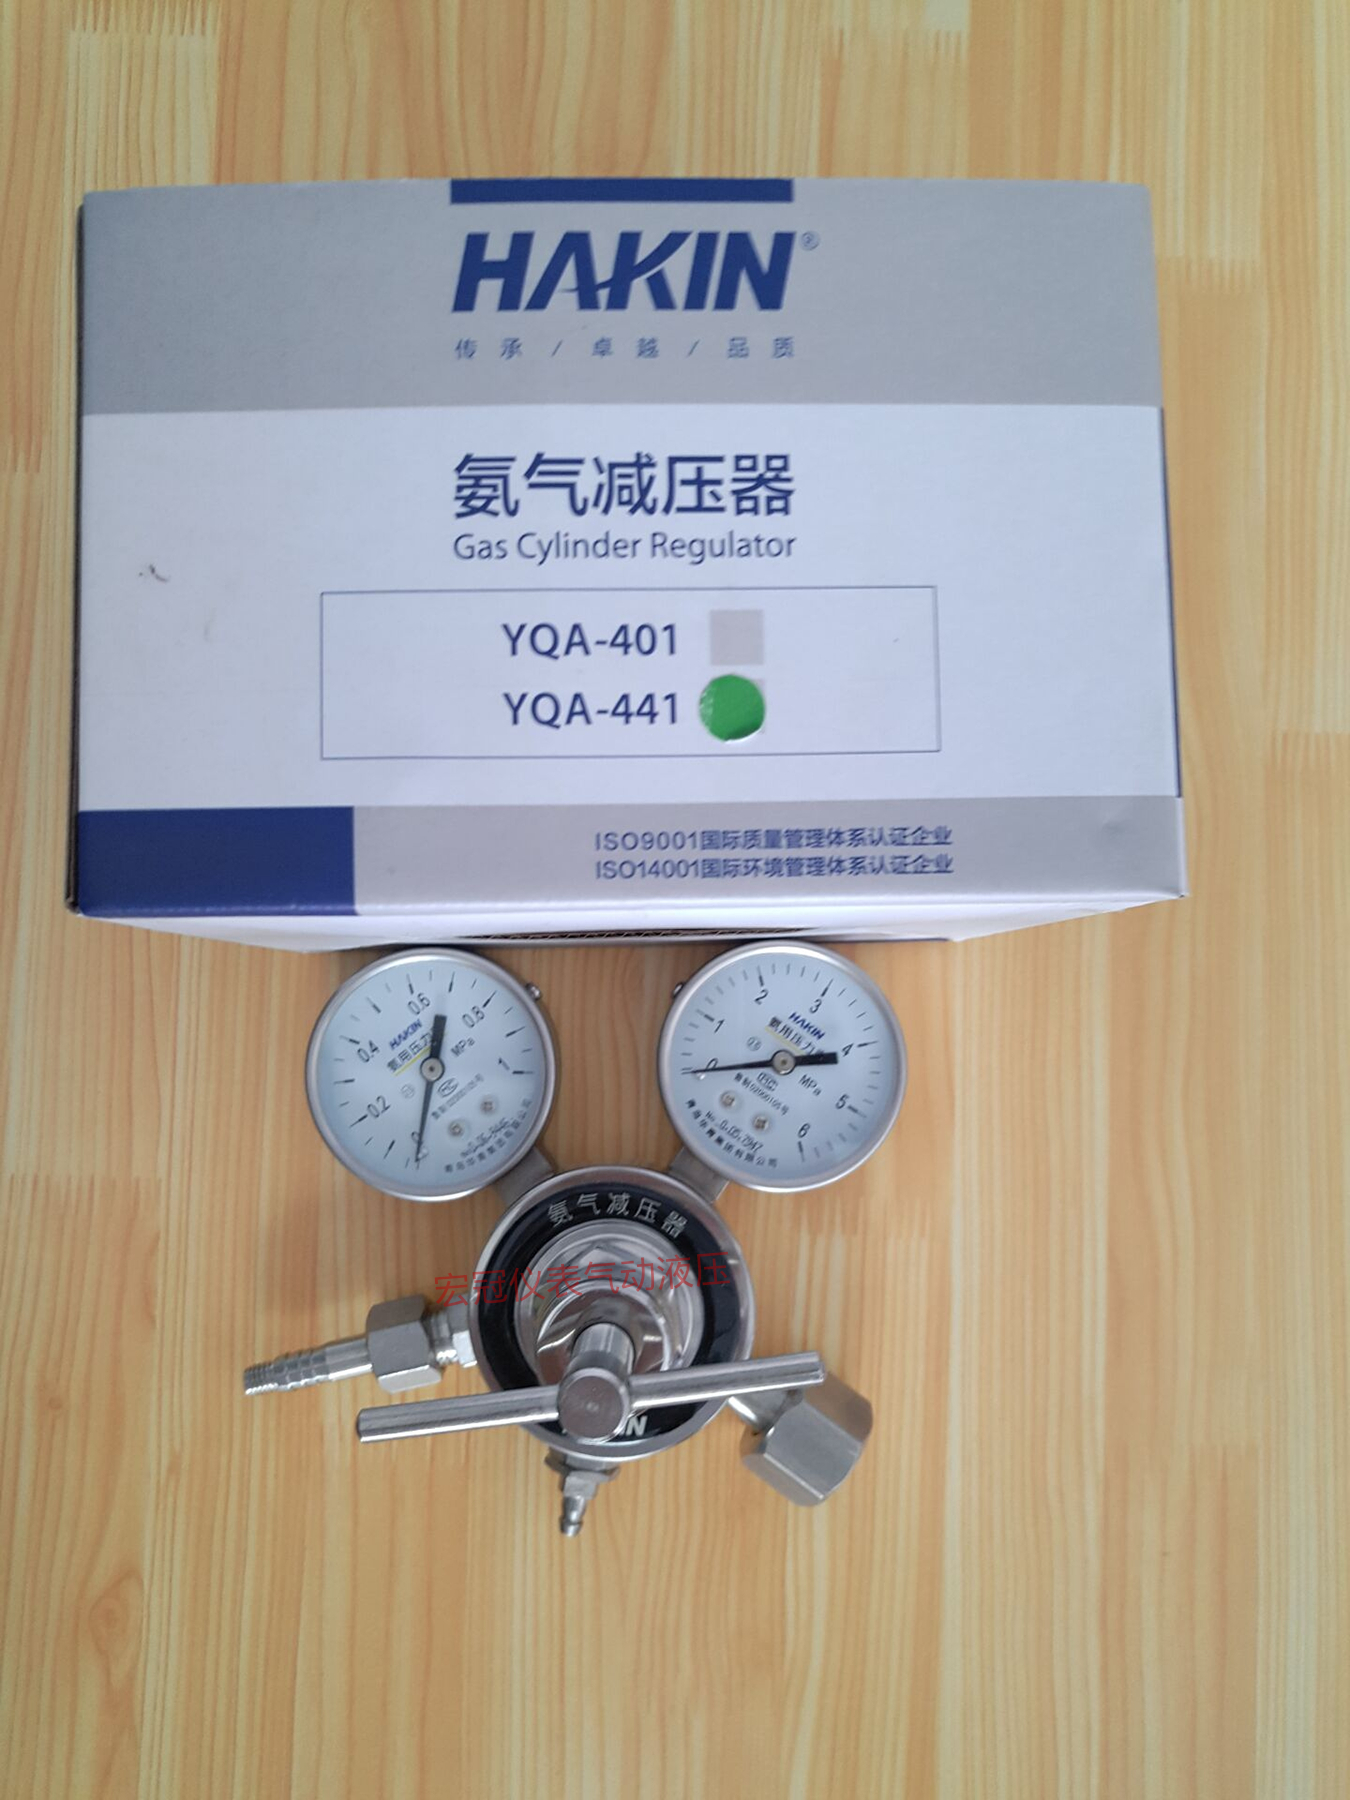 Qingdao HUA 青全 από ανοξείδωτο χάλυβα αμμωνία ρυθμιστής πίεσης YQA-441 αμμωνία Πίνακας αμμωνία βαλβίδα εκτόνωσης της πίεσης της αμμωνίας βαλβίδα φιάλης